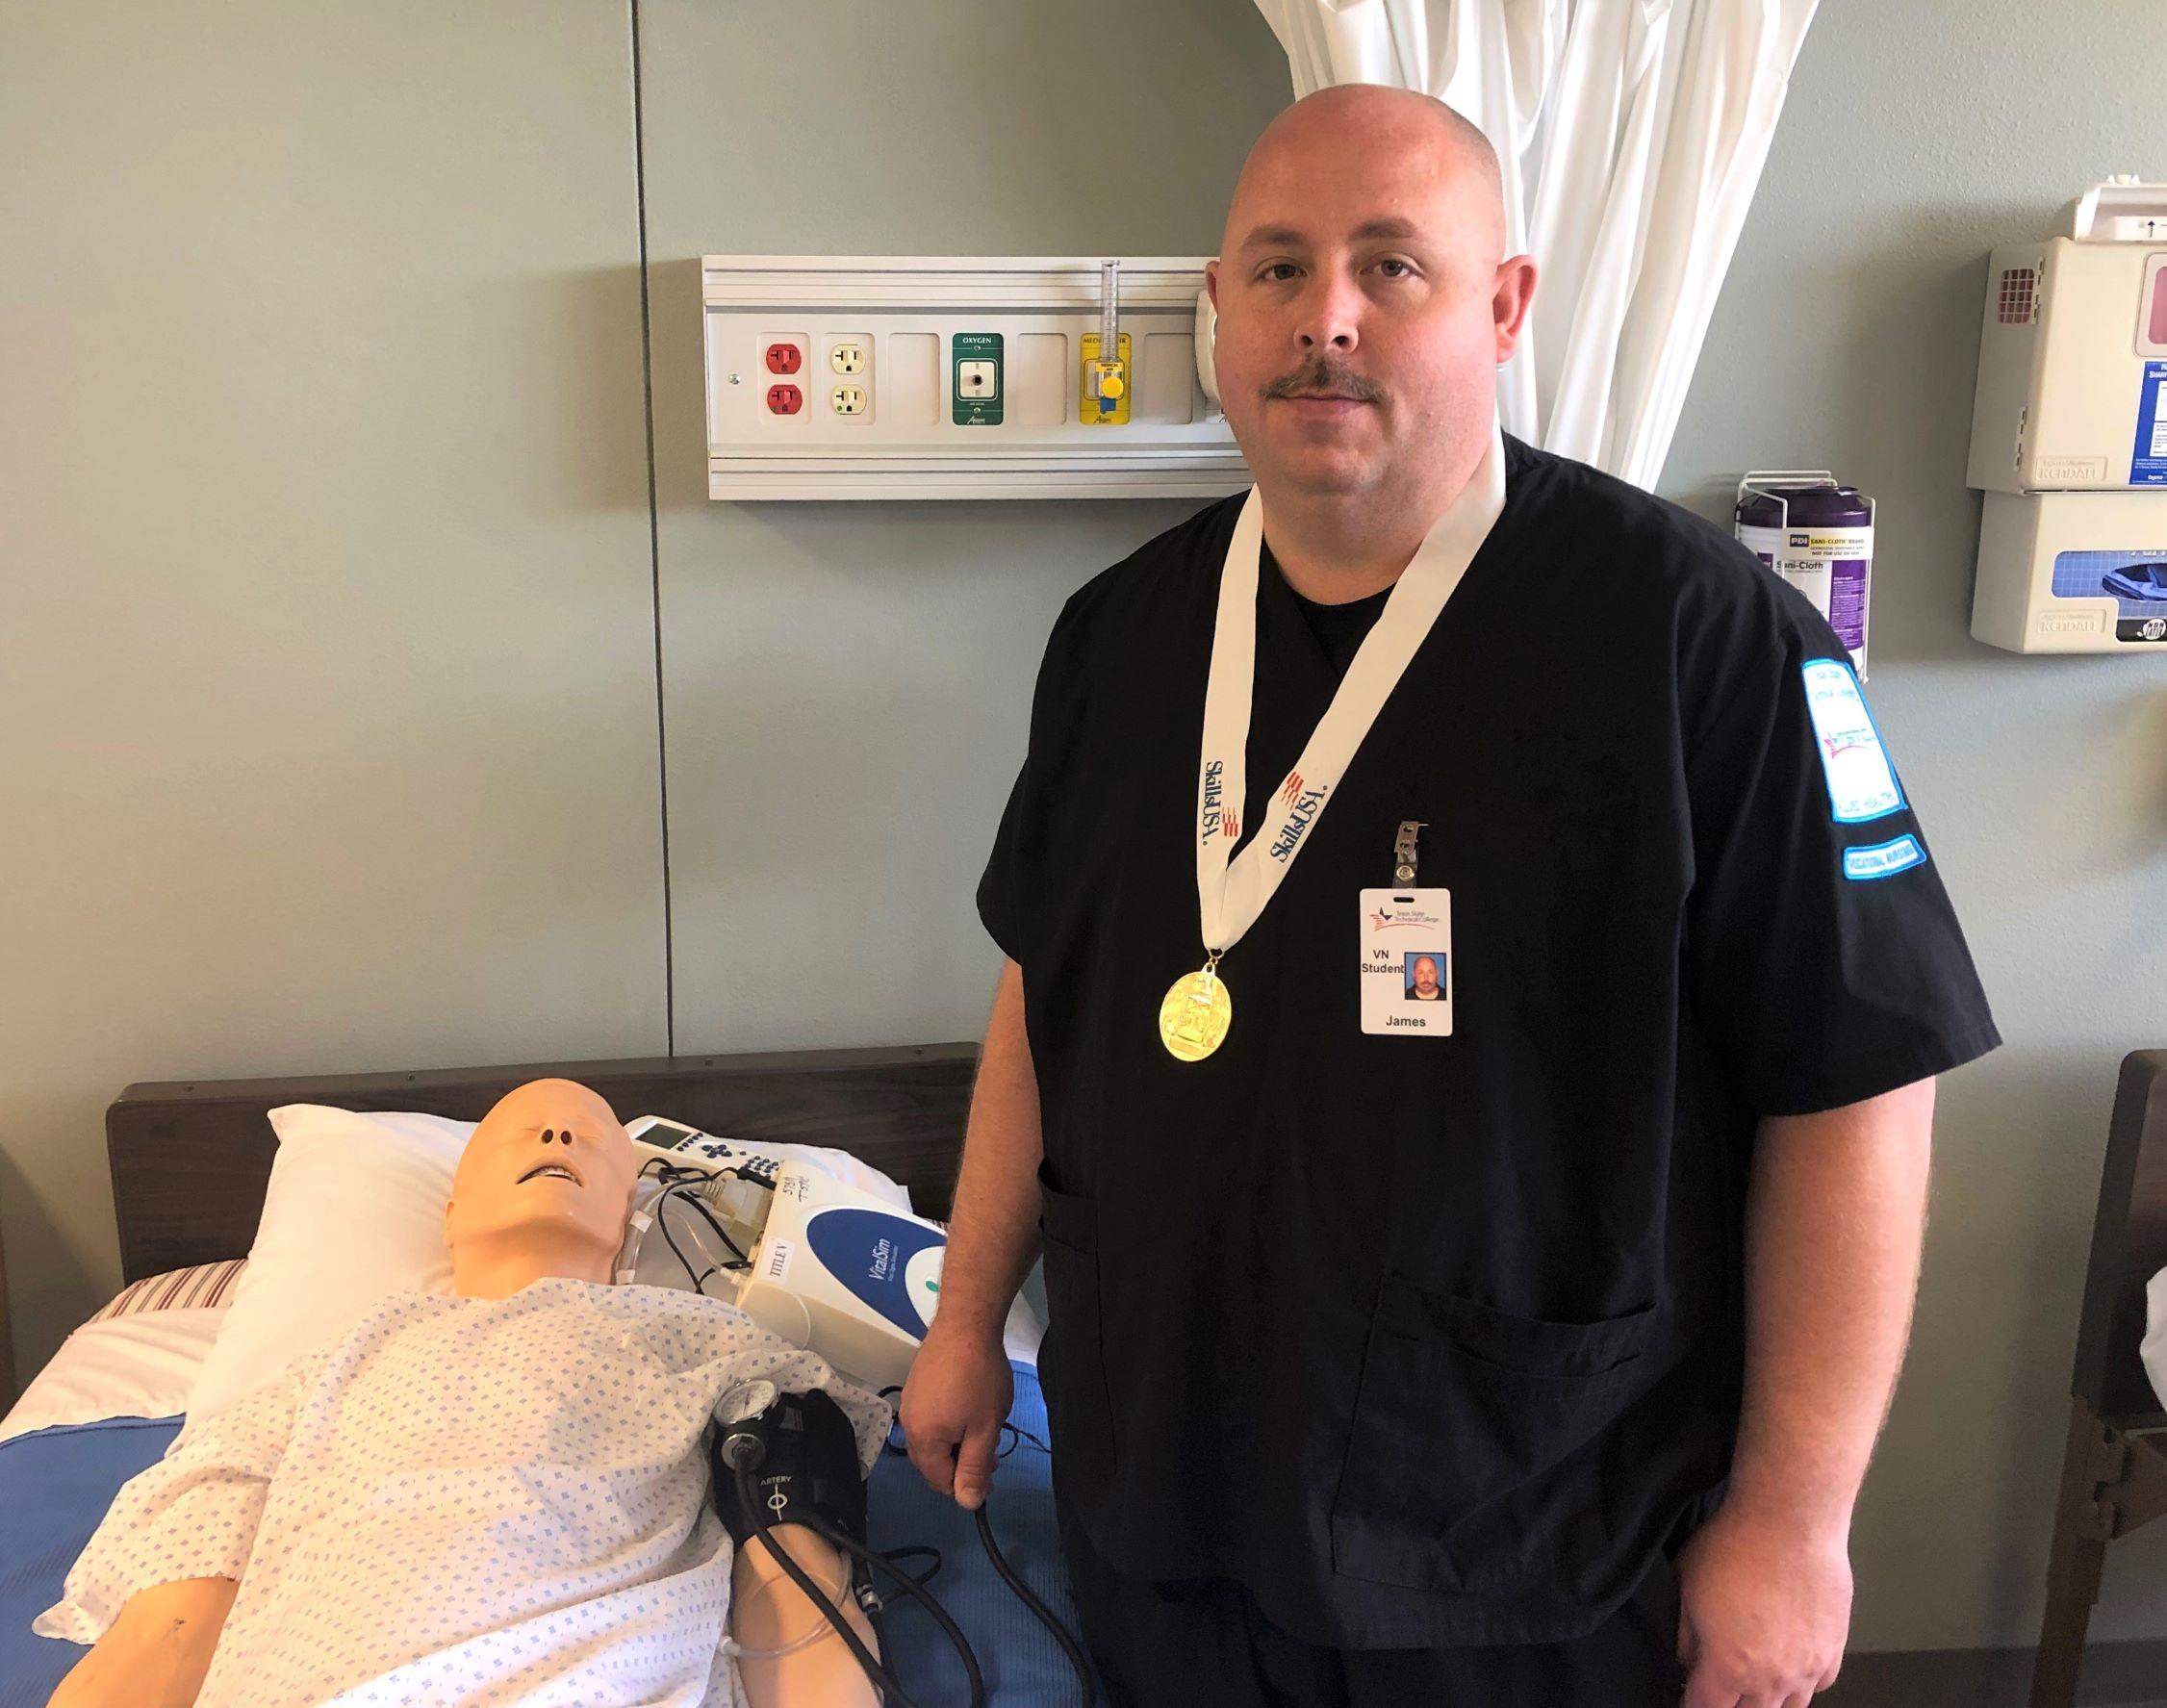 TSTC Student Veteran to Compete at SkillsUSA Nationals